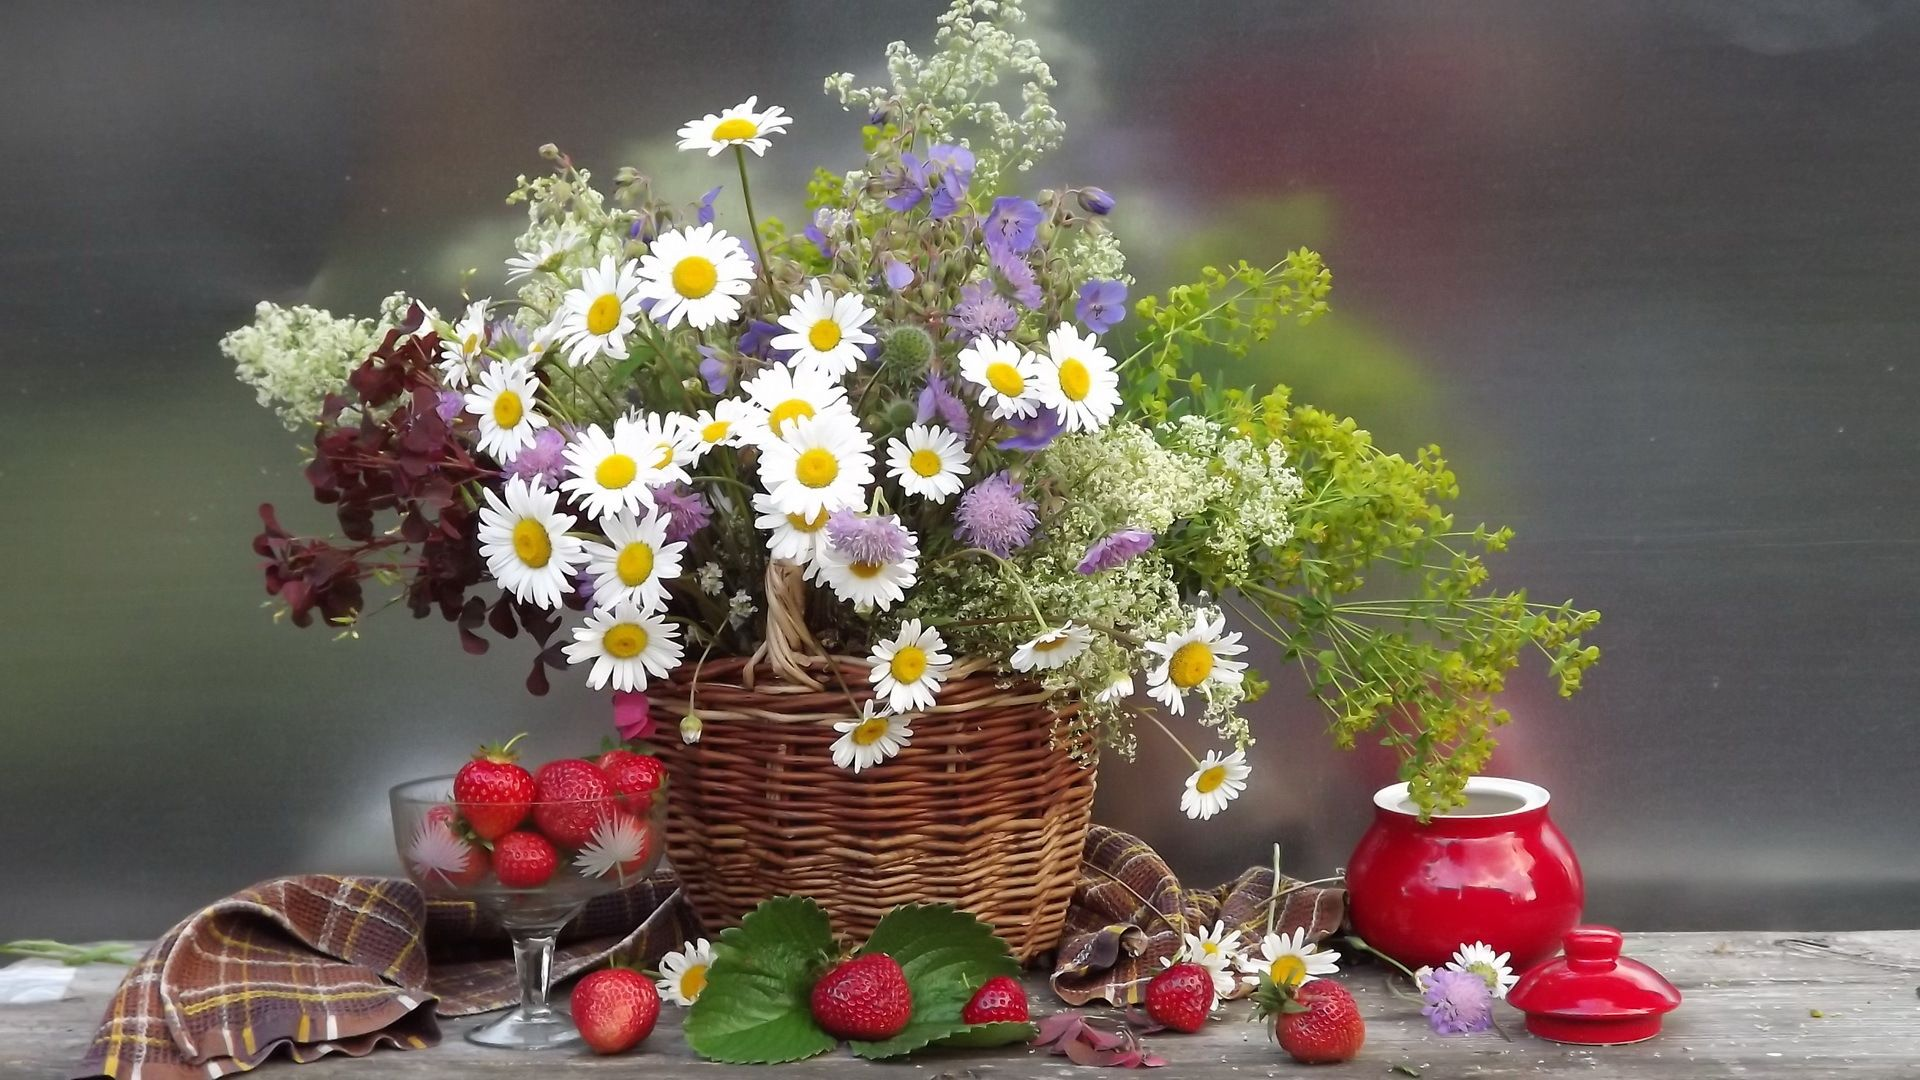 Daisies Flowers Flower Bouquet Strawberries Berries Still Life Wallpaper